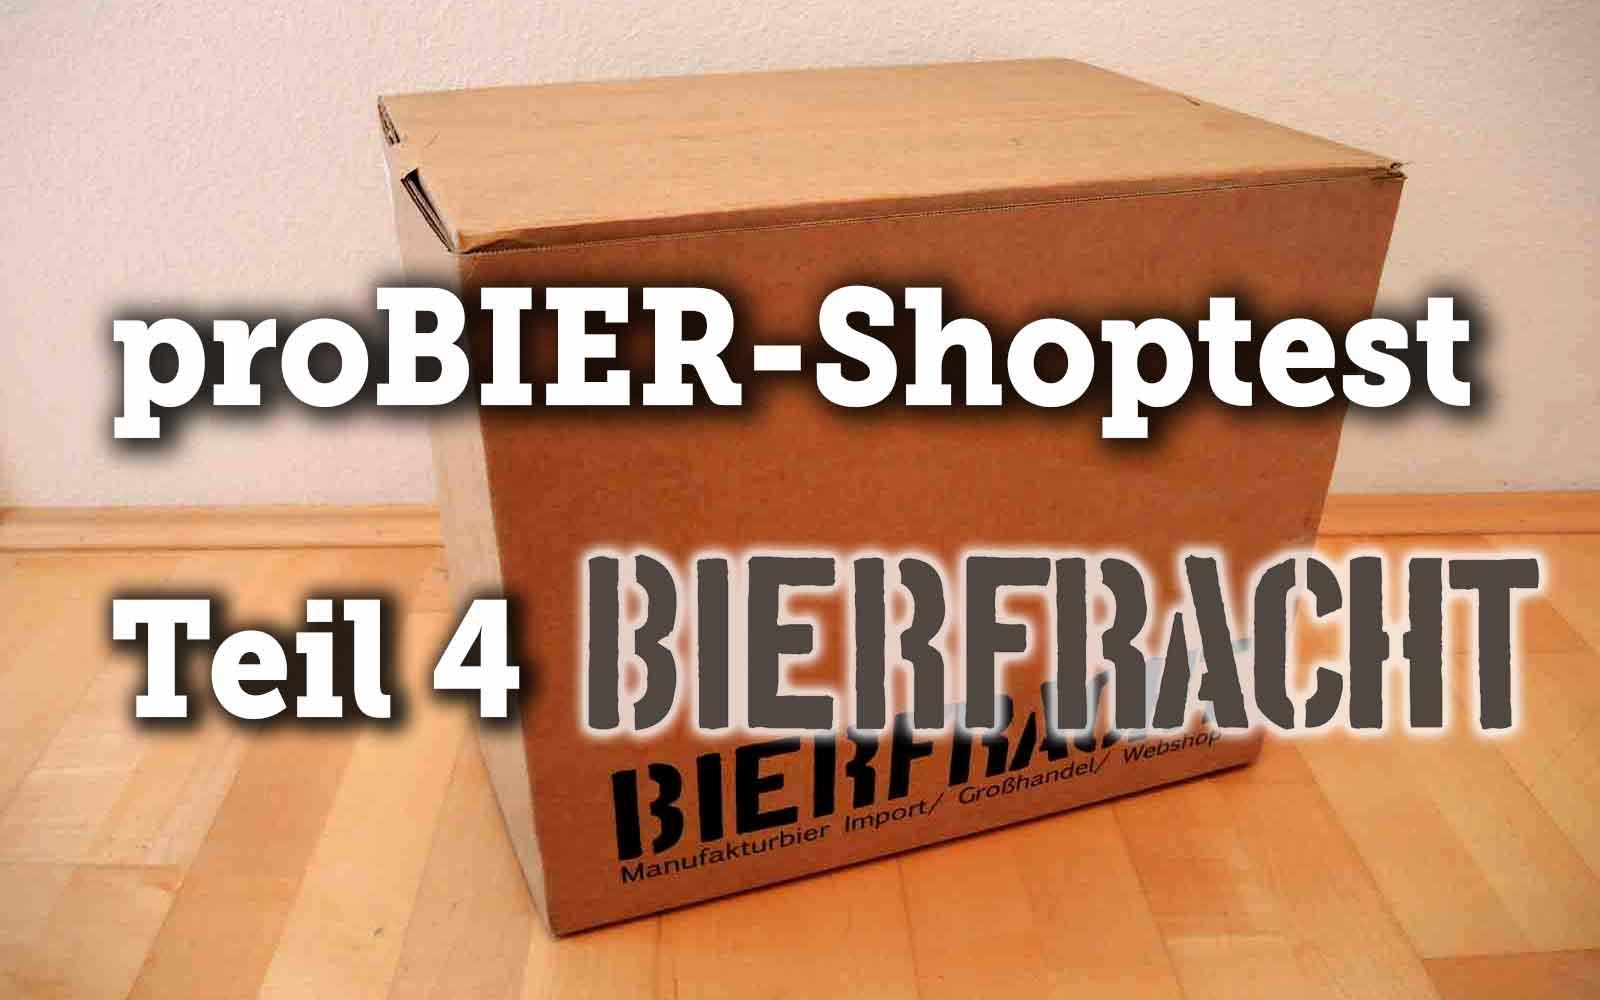 proBIER!-Shoptest Teil 4: BIERFRACHT – A